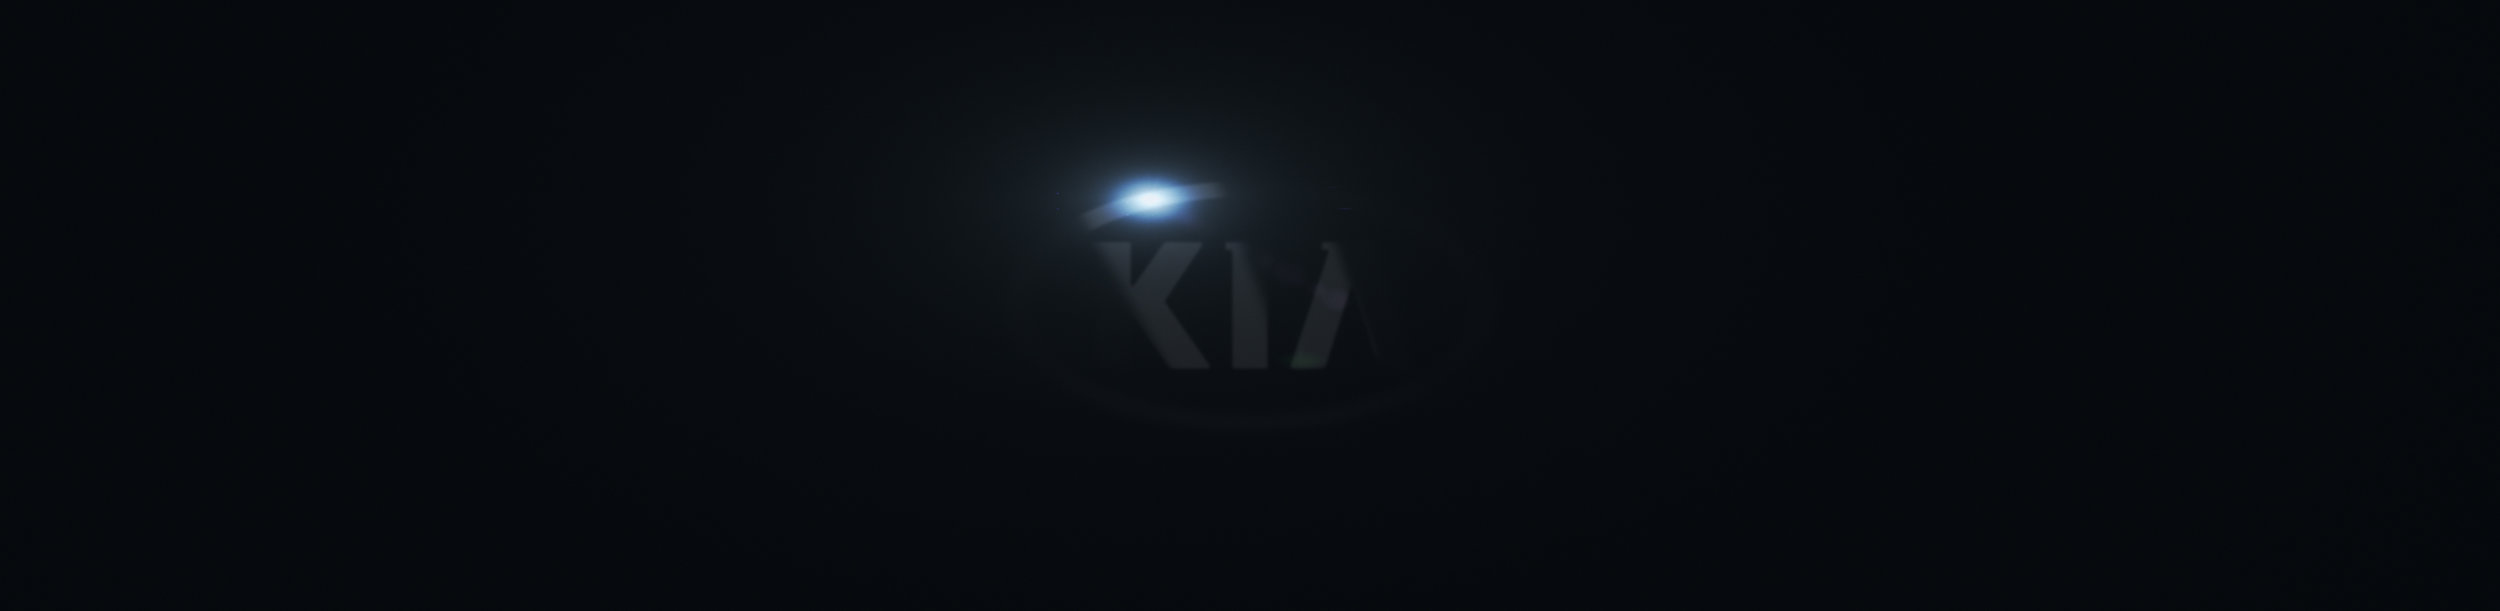 02.KIA_K900_Panels_LOGO-Transition_01.jpg